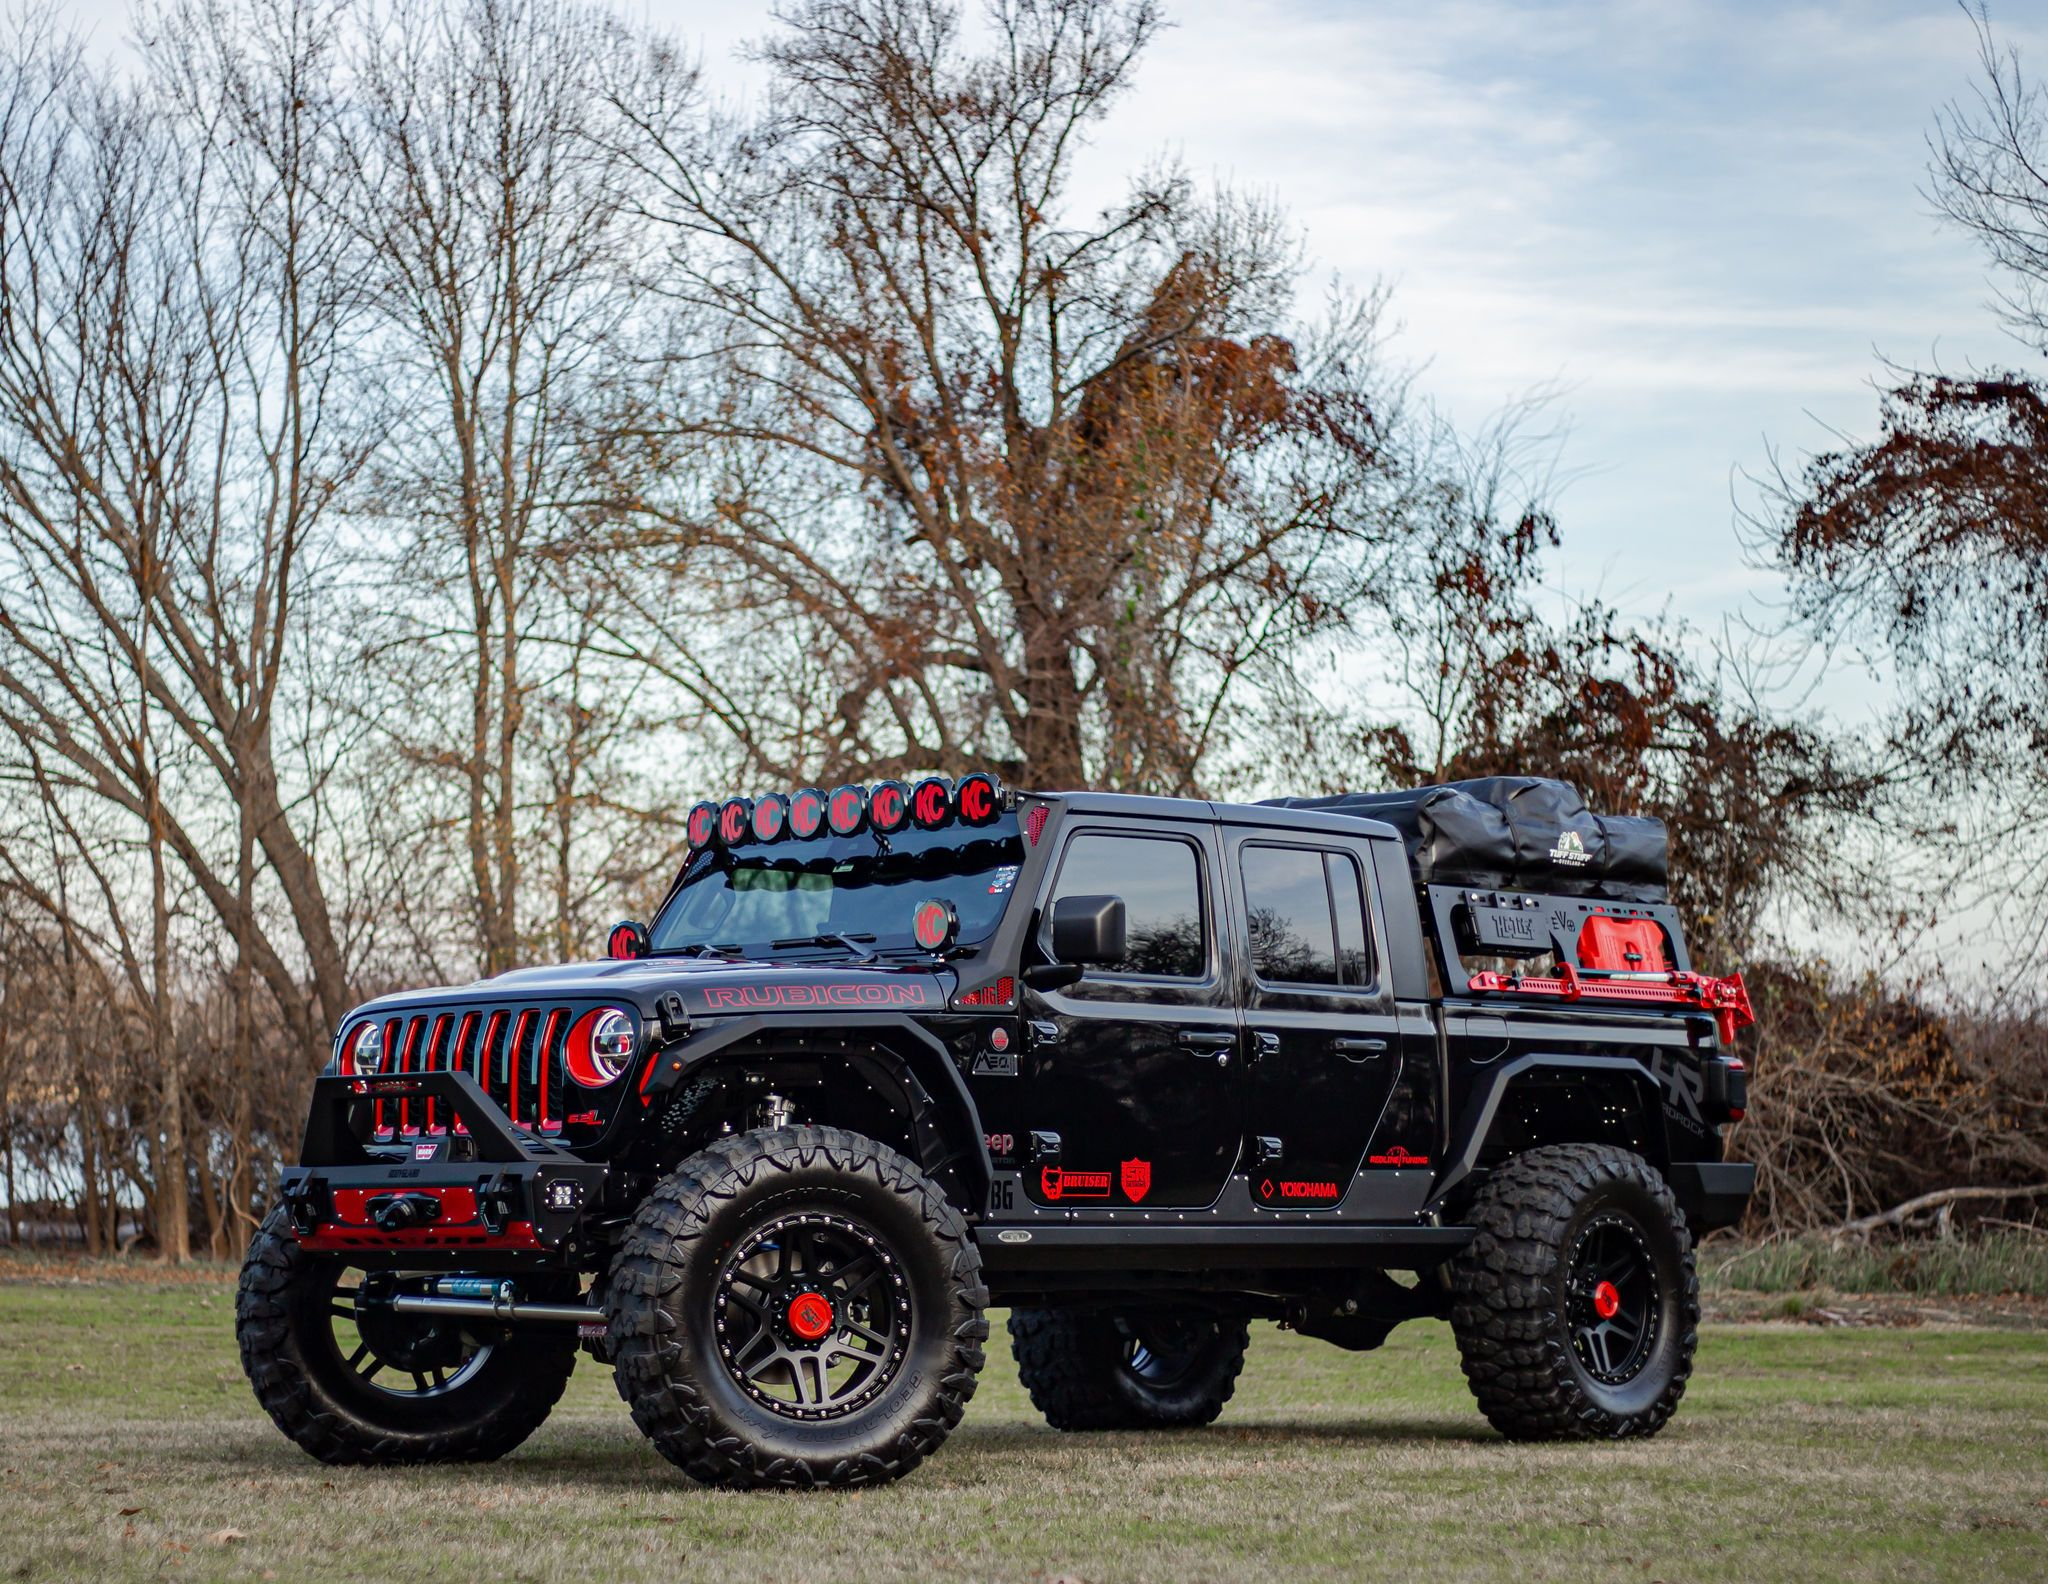 2020 Jeep Gladiator Engine Upgrades